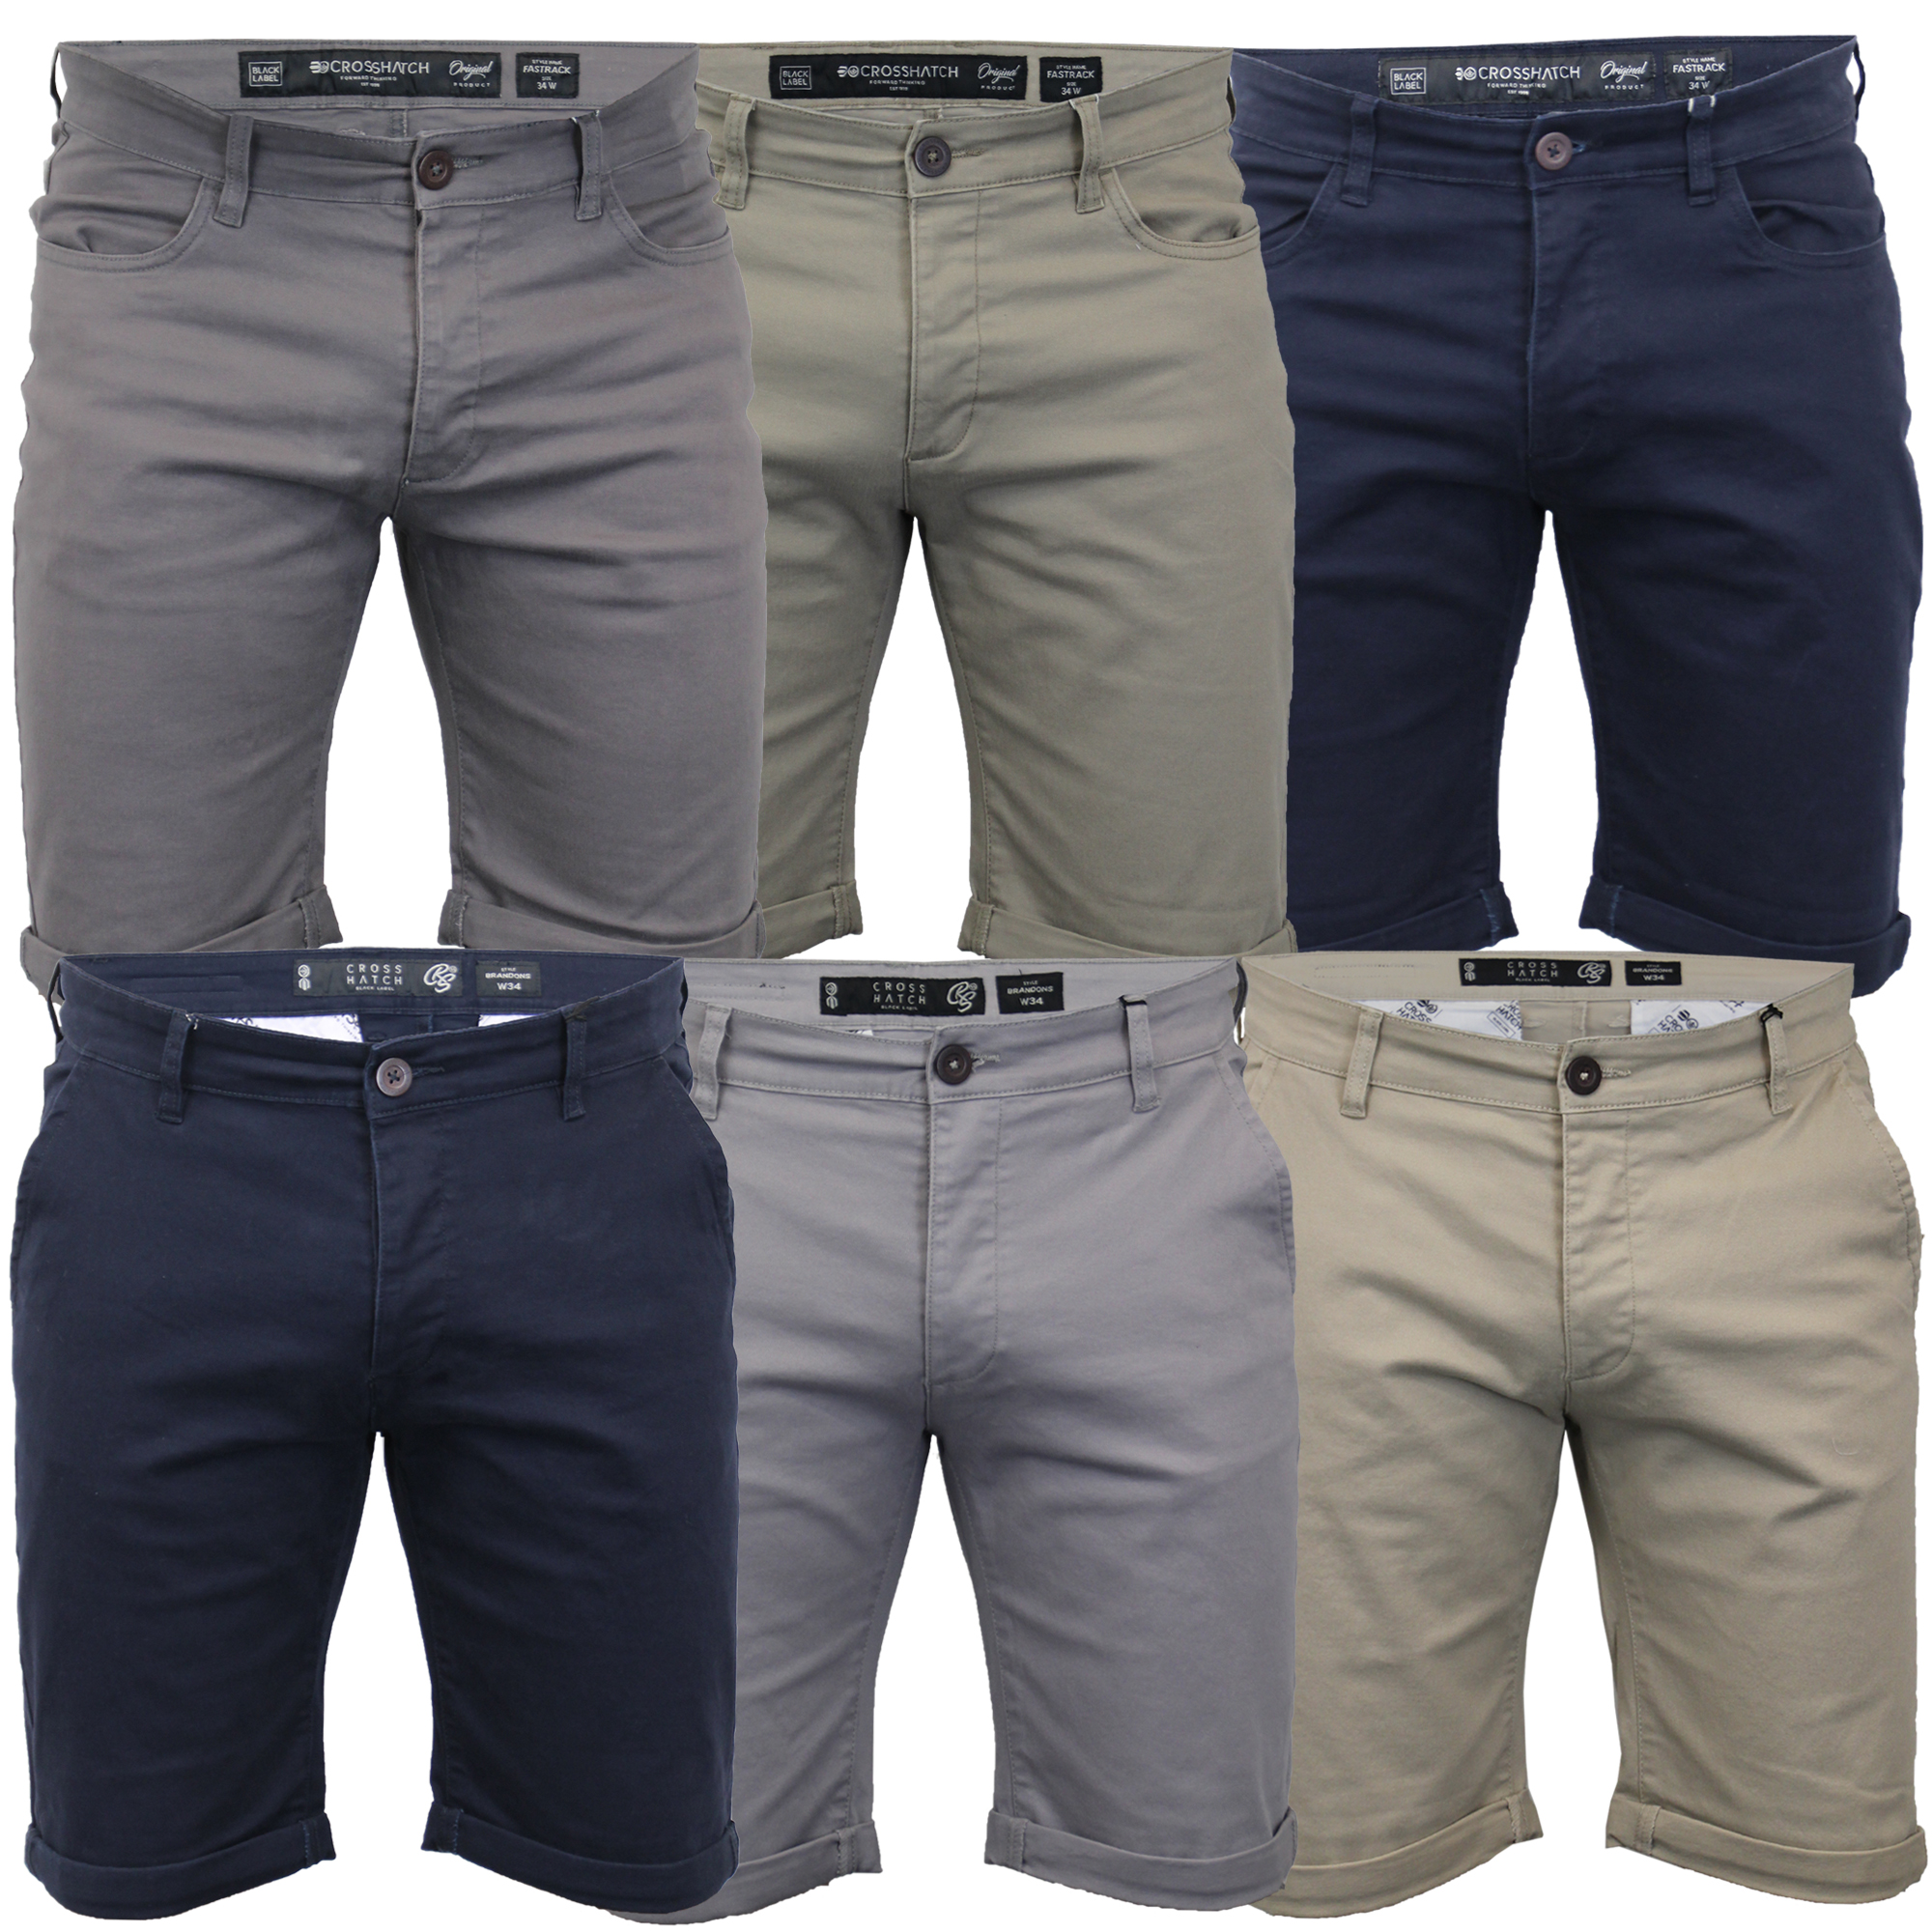 Mens-Chino-Shorts-Crosshatch-Brandons-Knee-Length-Fastrack-Roll-Up-Summer-New thumbnail 4